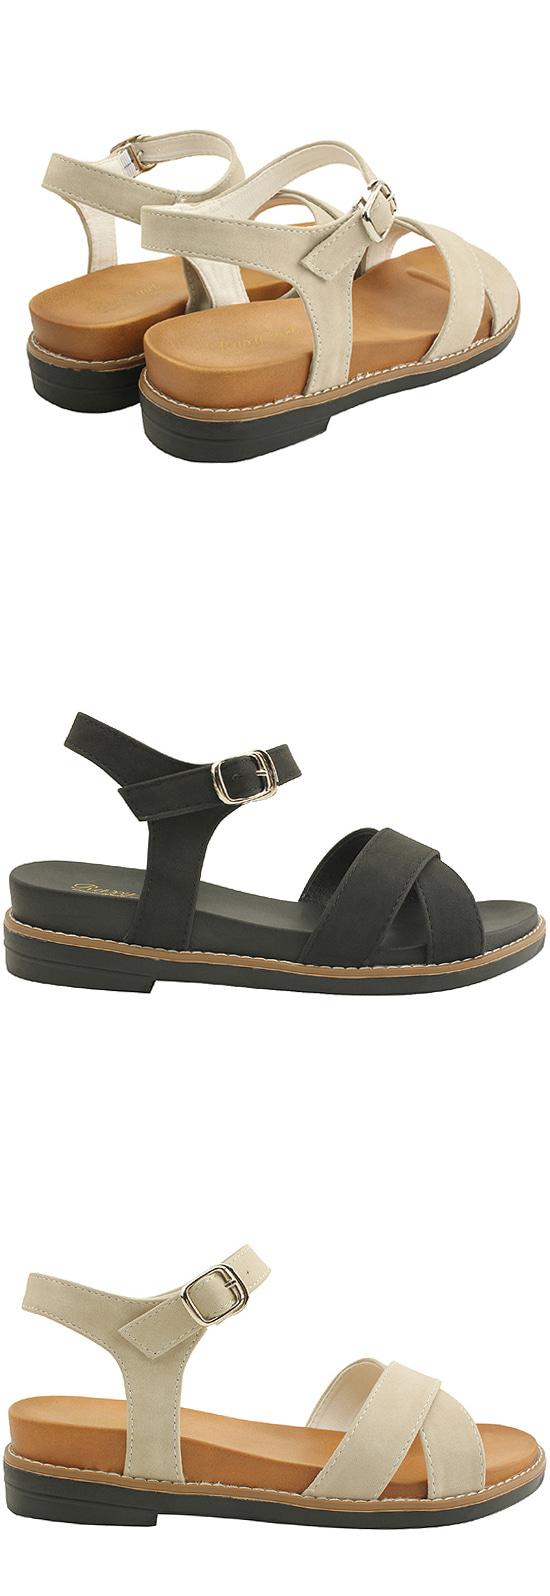 Comfort Cushion X Strap Flat Sandals Beige